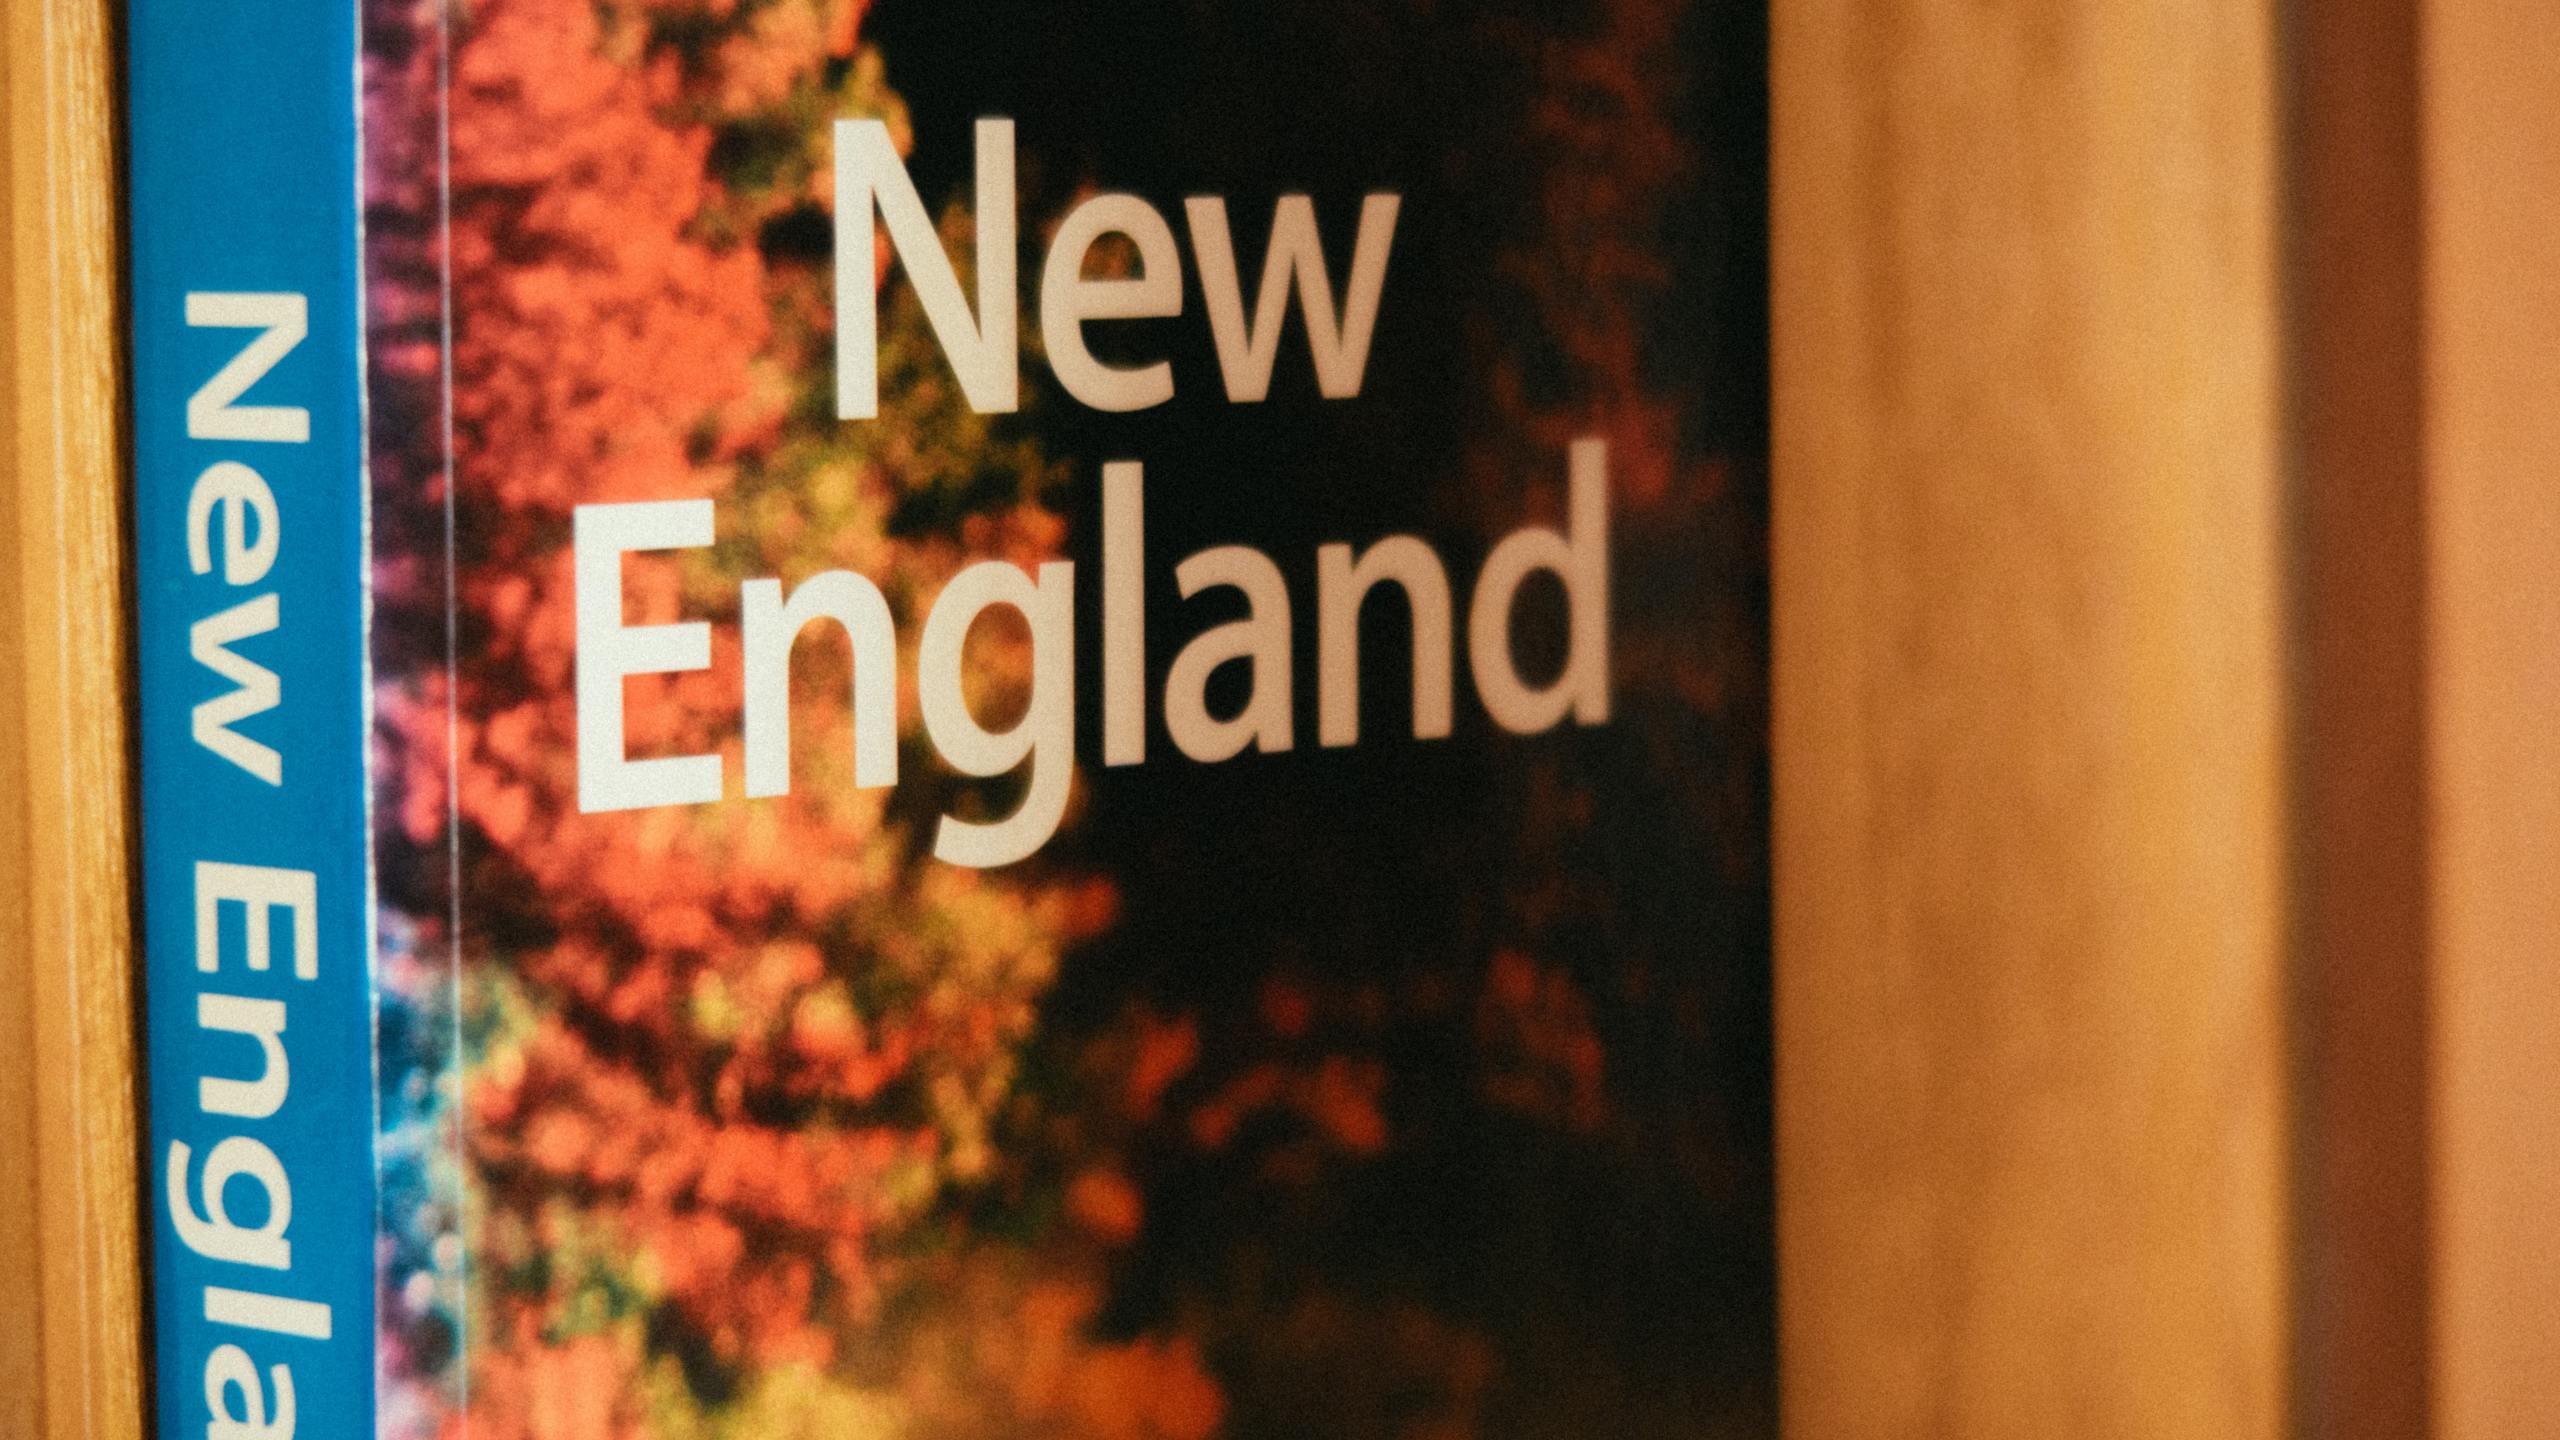 New England (Athena / Pexels)